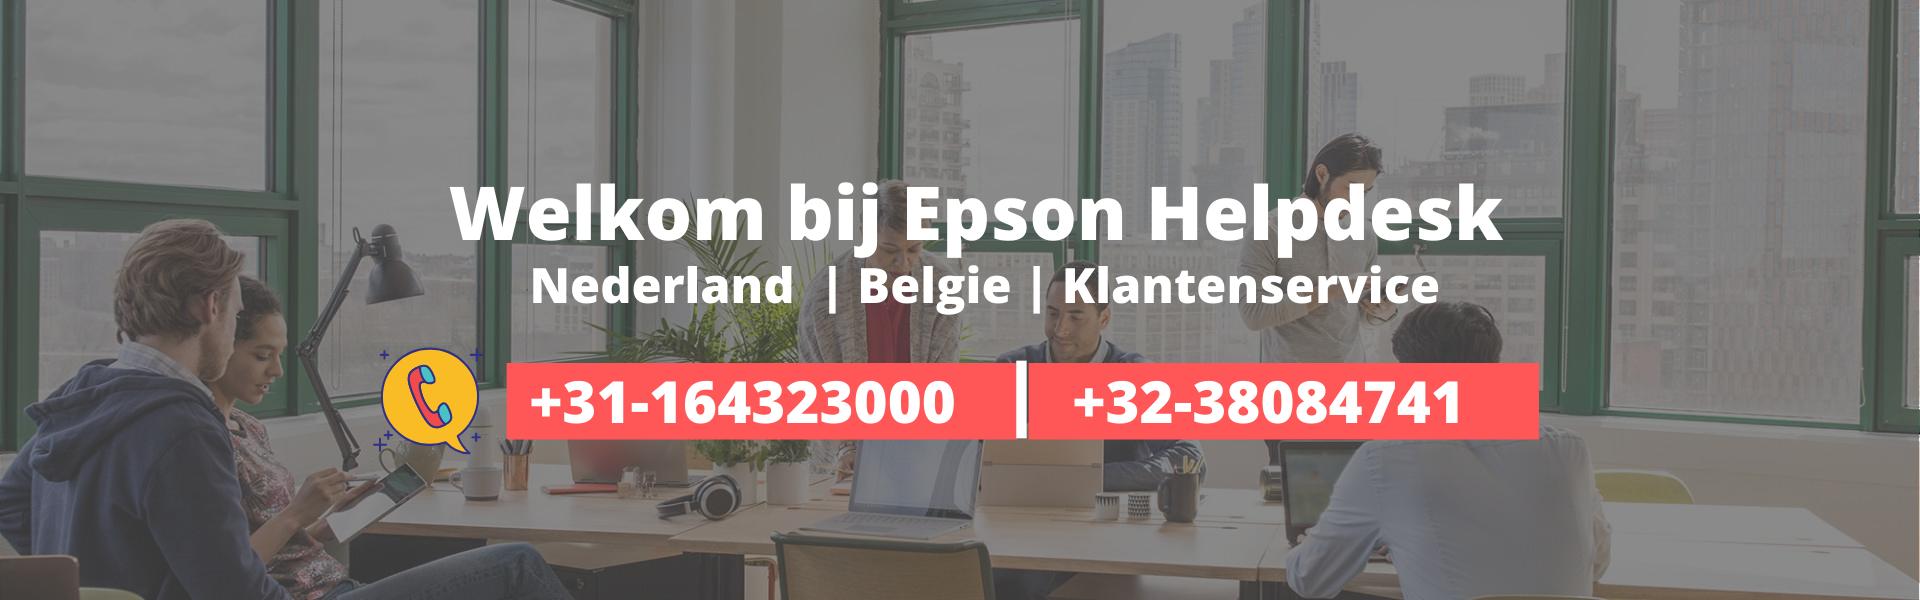 Epson Telefoonnummer